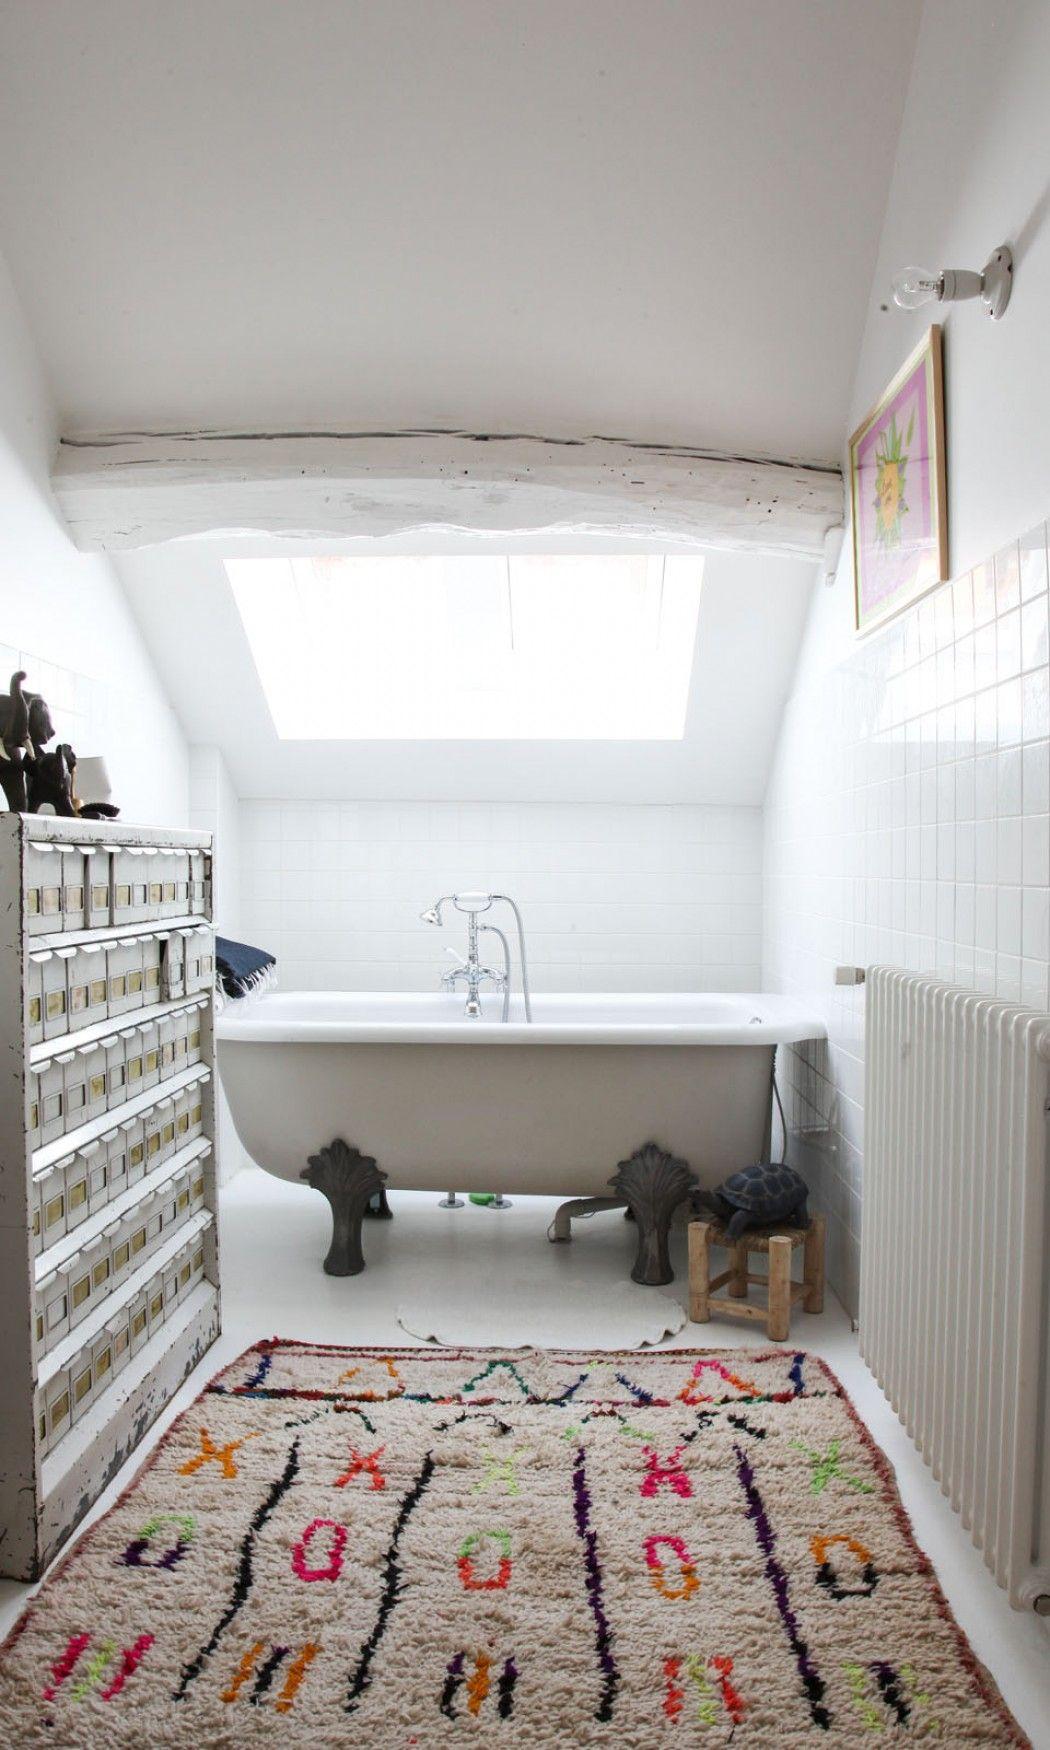 Magasin Salle De Bain Croix Blanche ~ the socialite family dijon salle de bain chez clarisse prudent